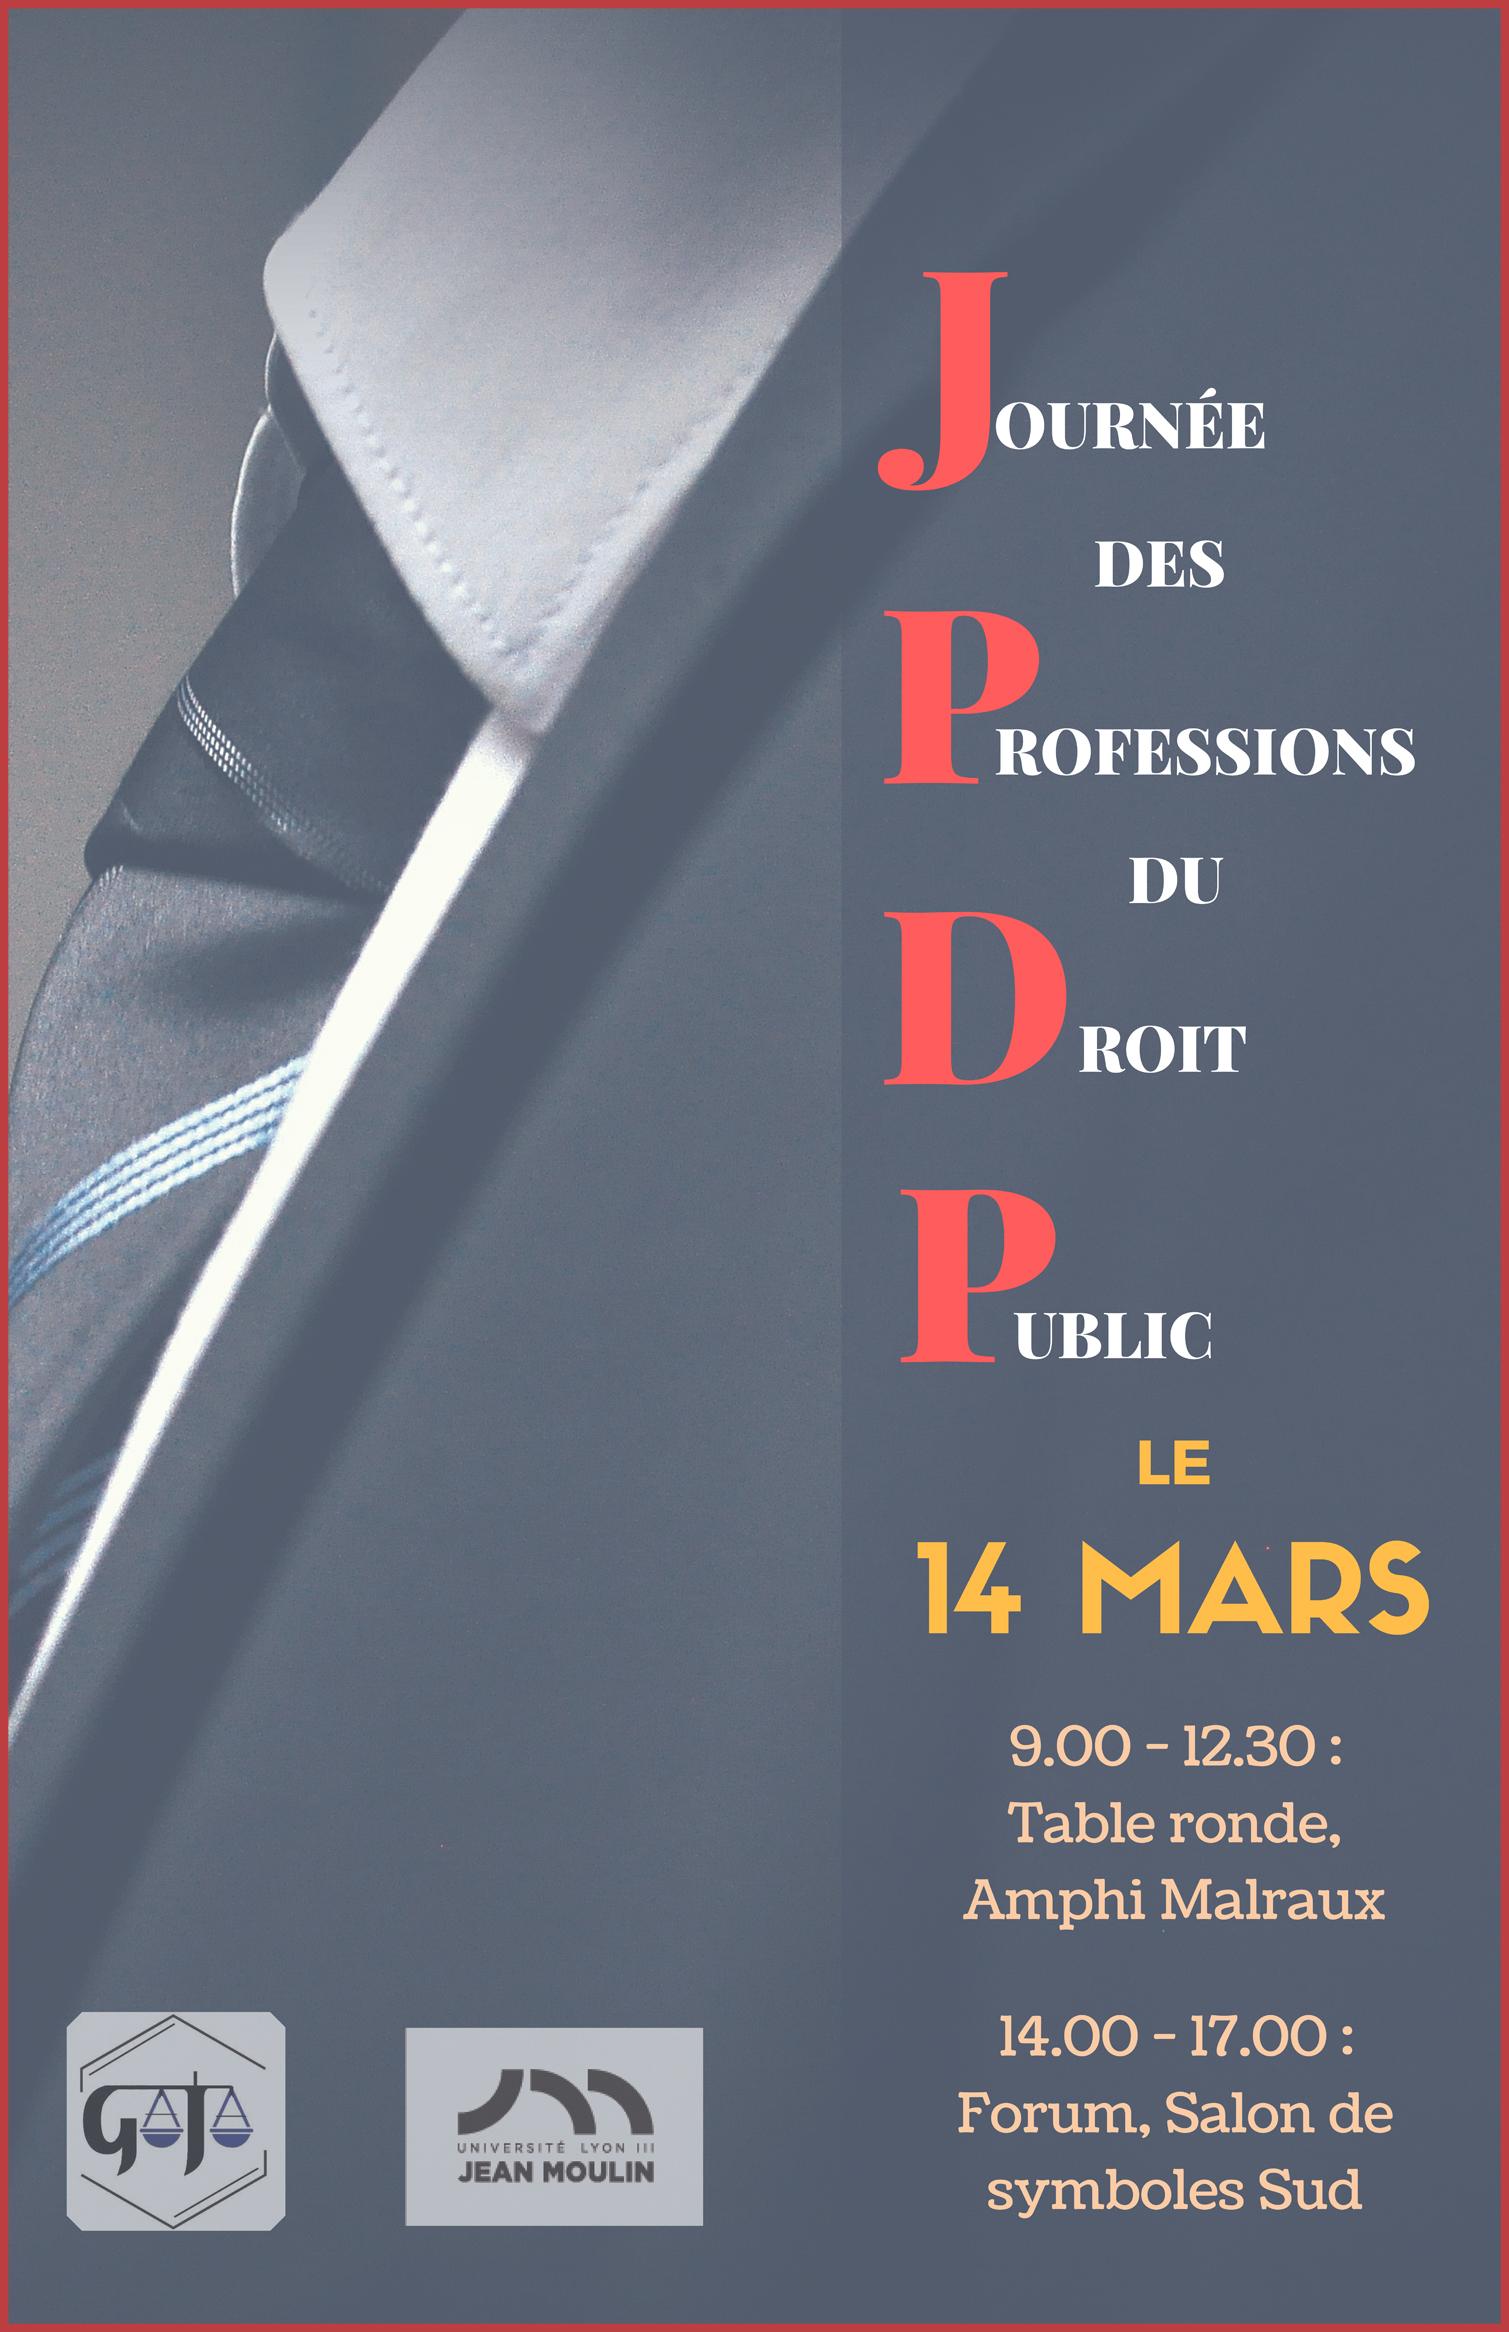 JPDP 14 mars 2017